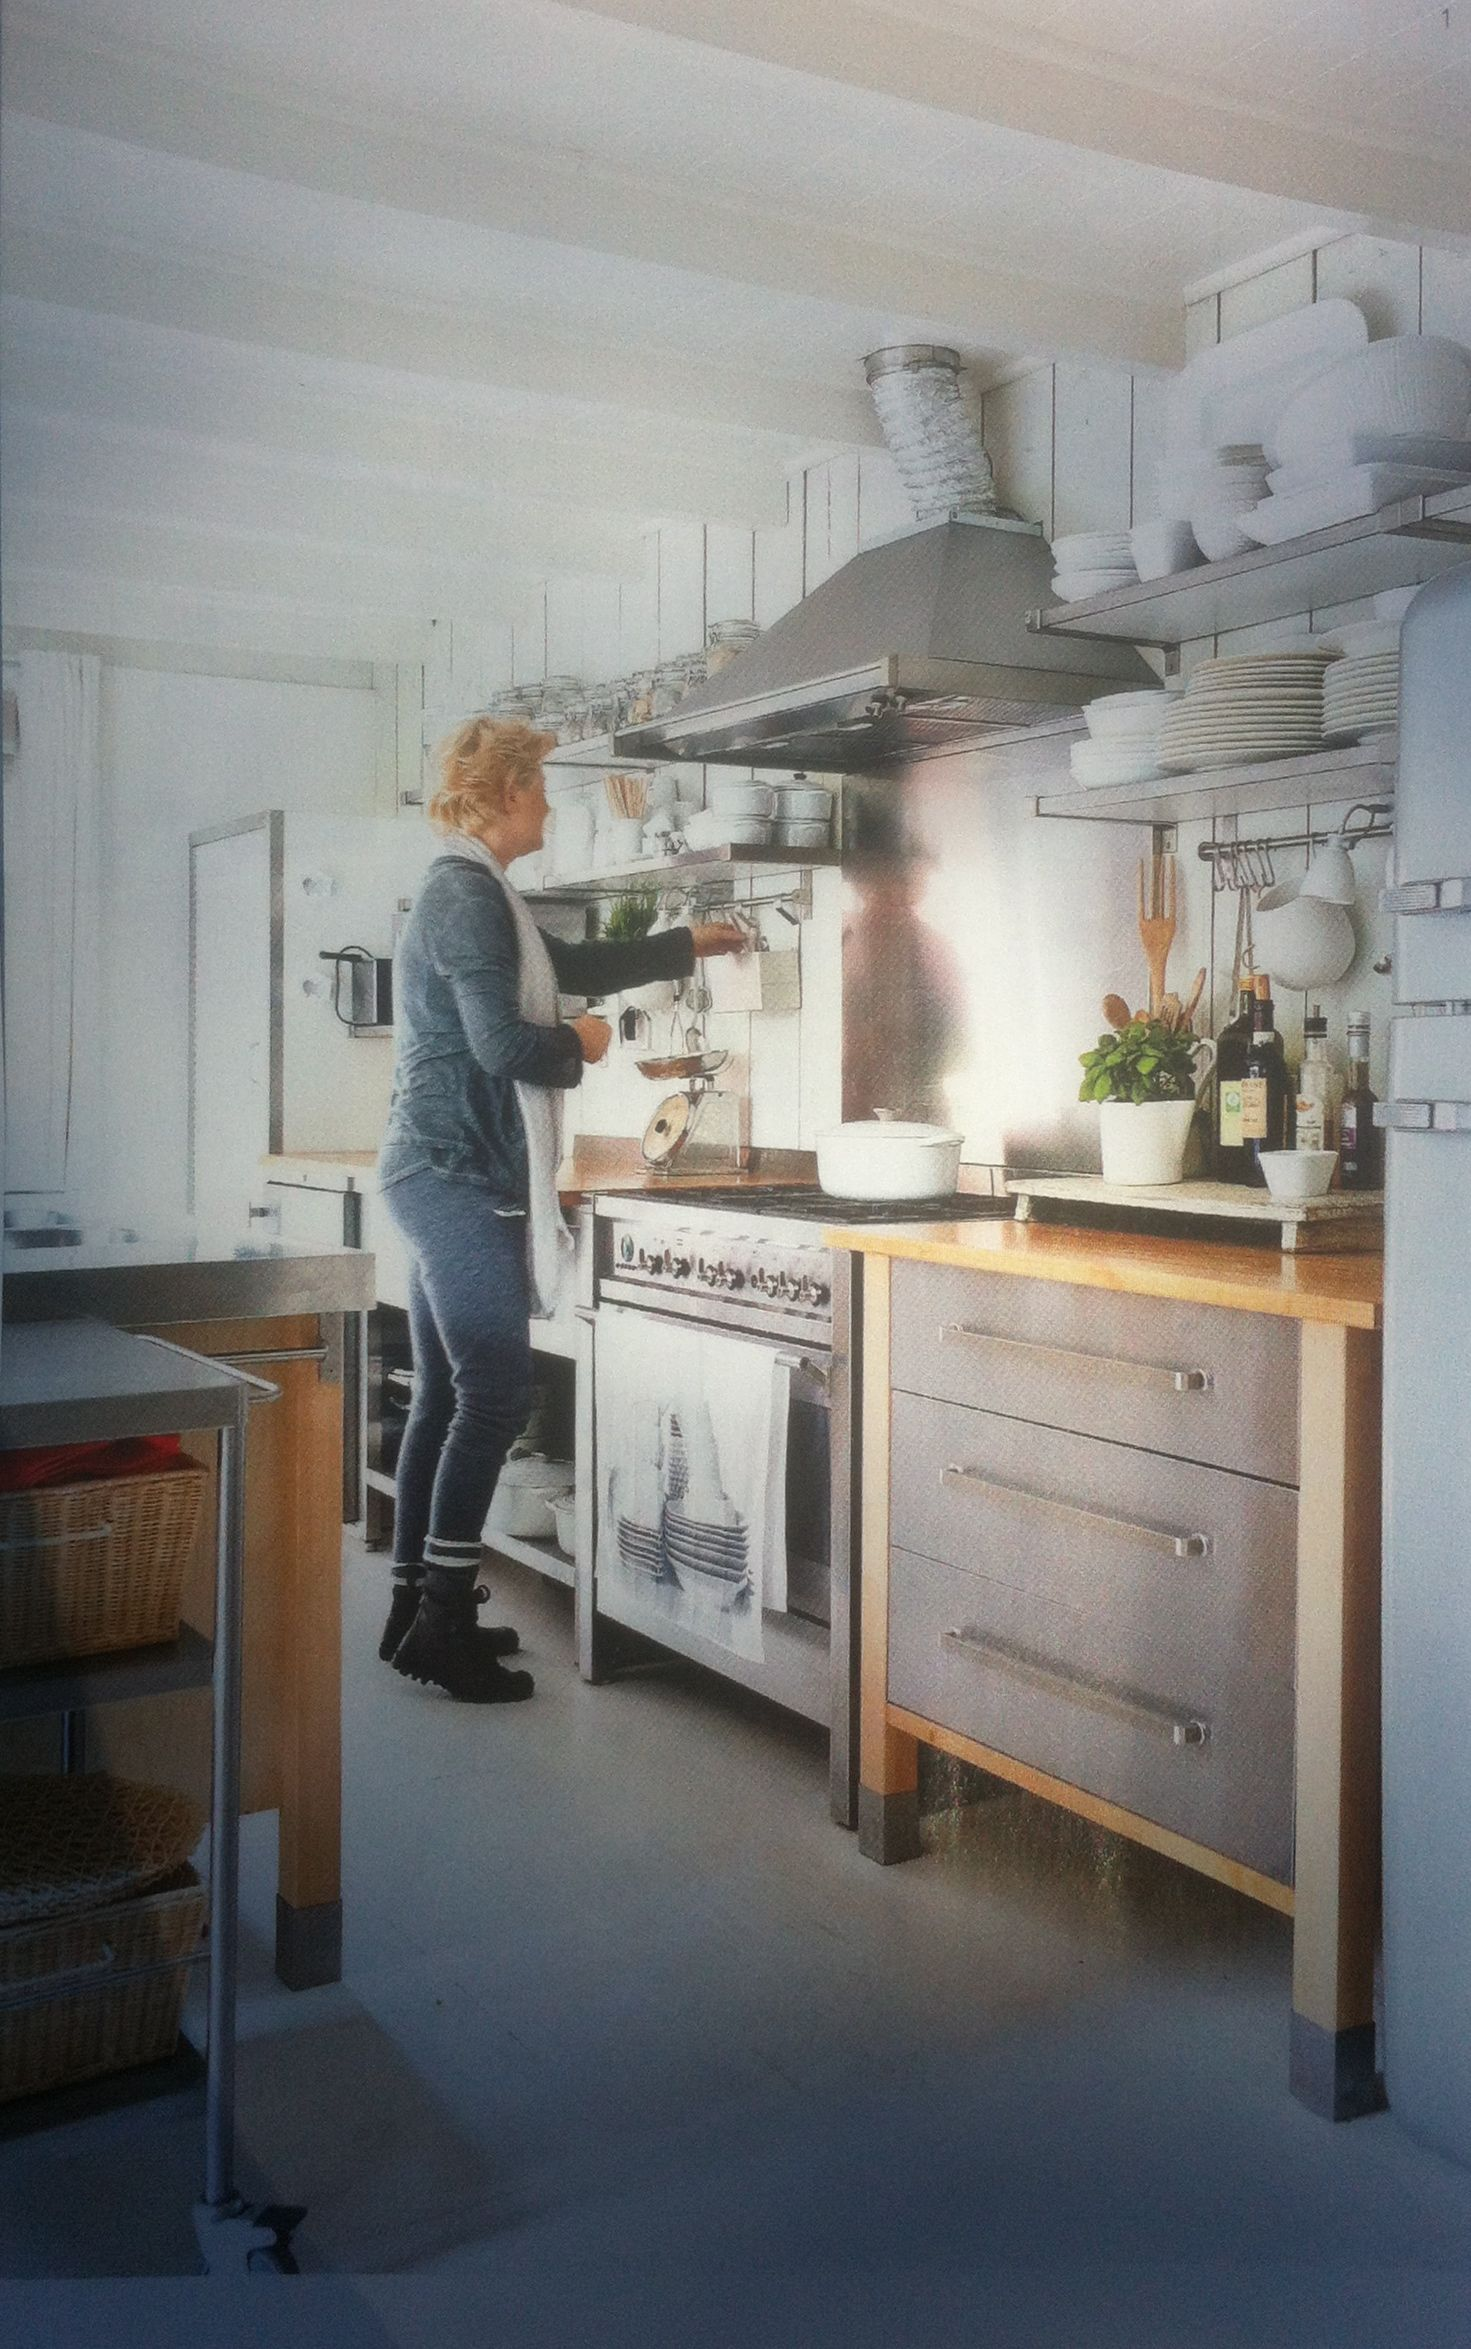 samengestelde keuken